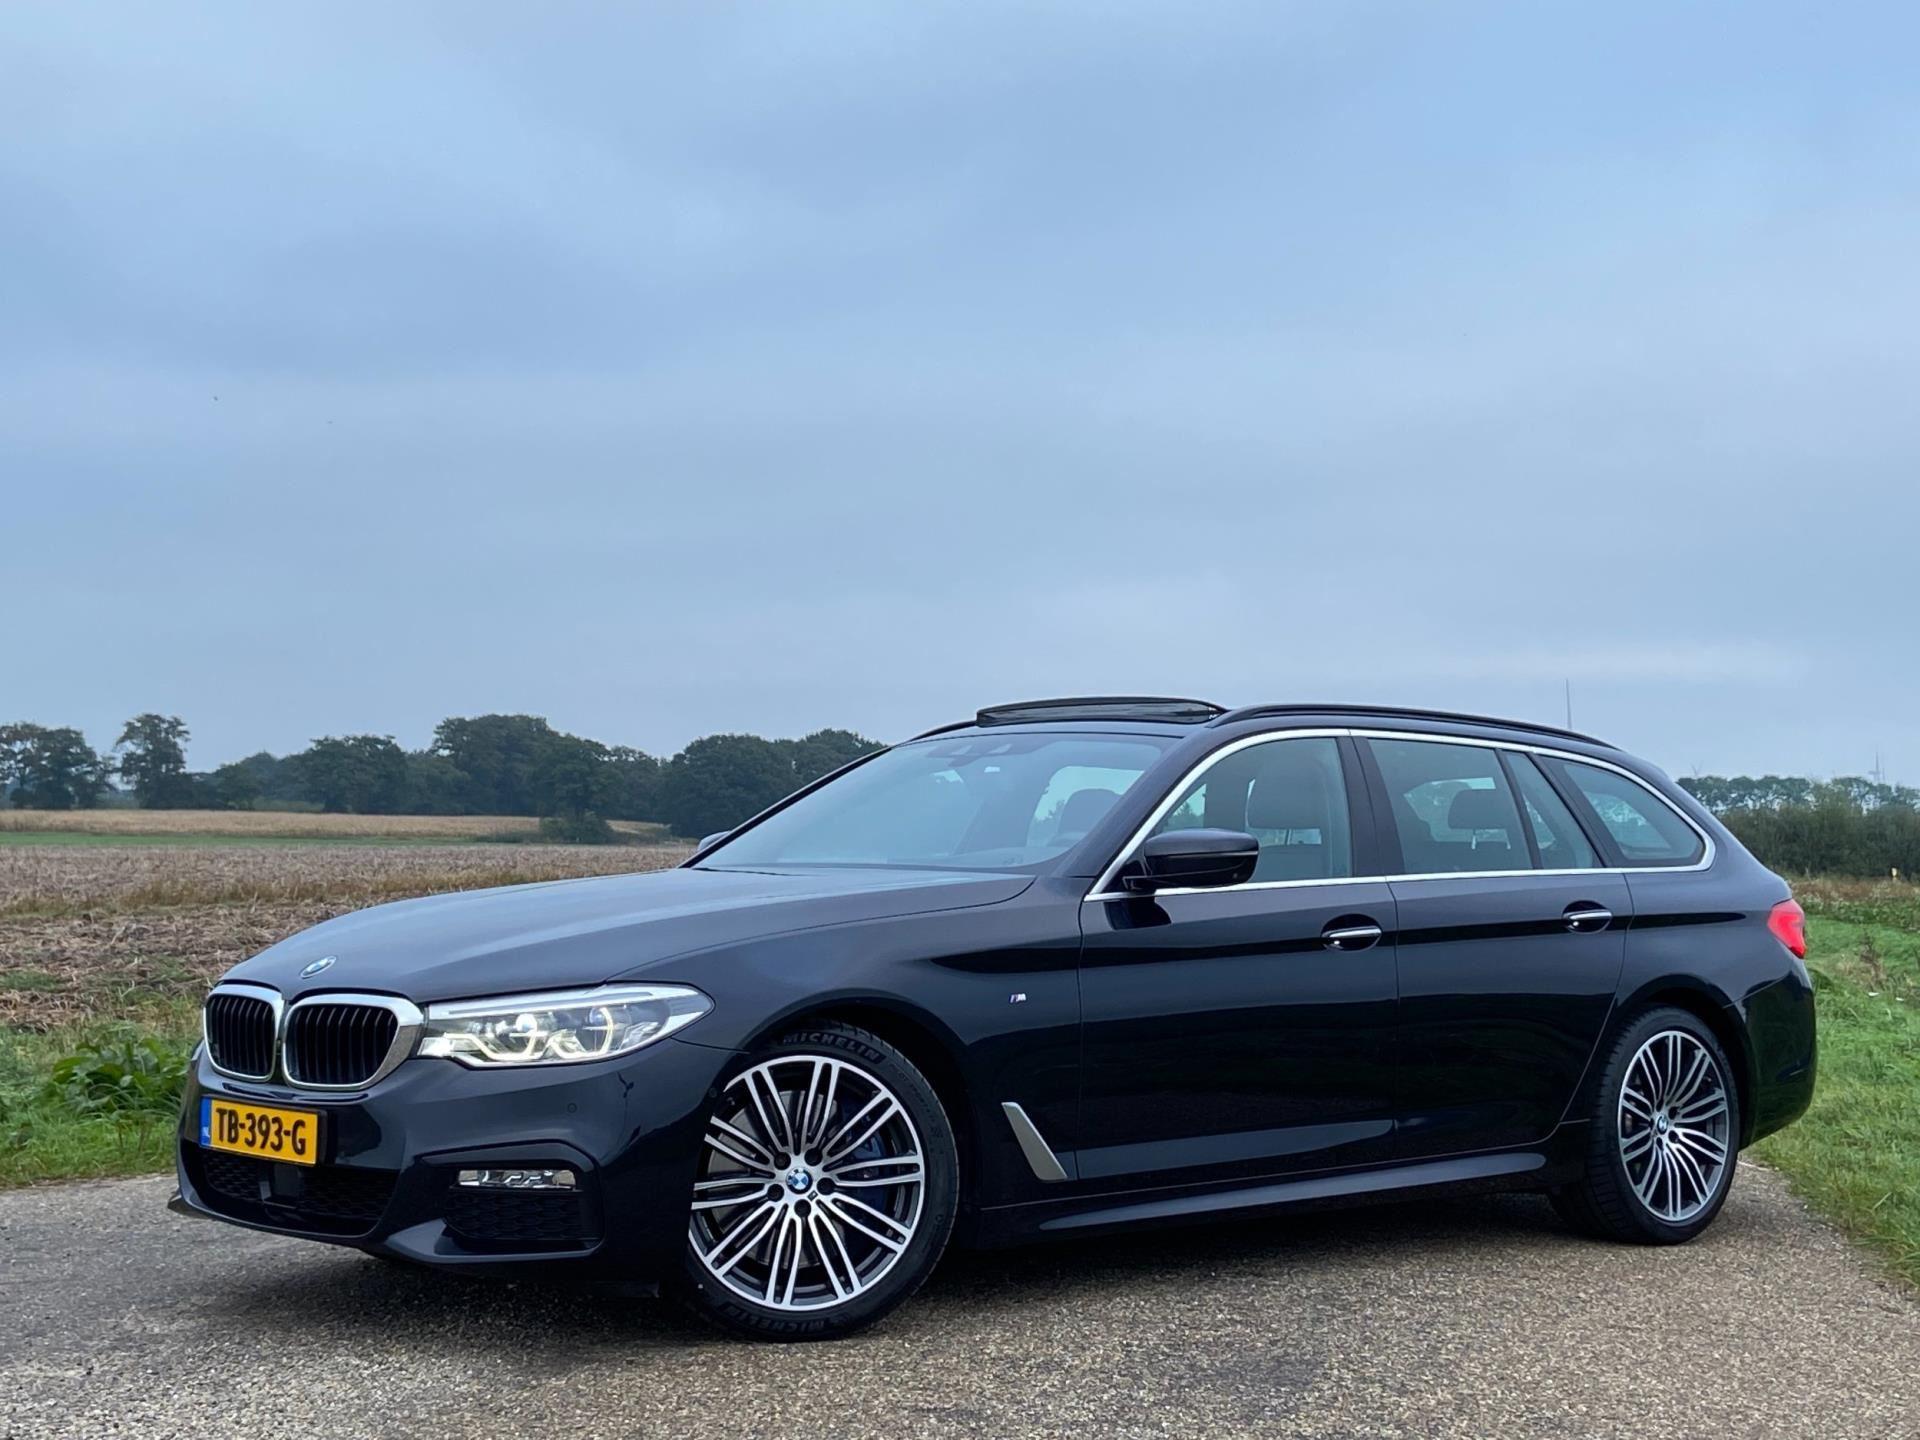 BMW 5-serie Touring occasion - Autobedrijf Tromp v.o.f.